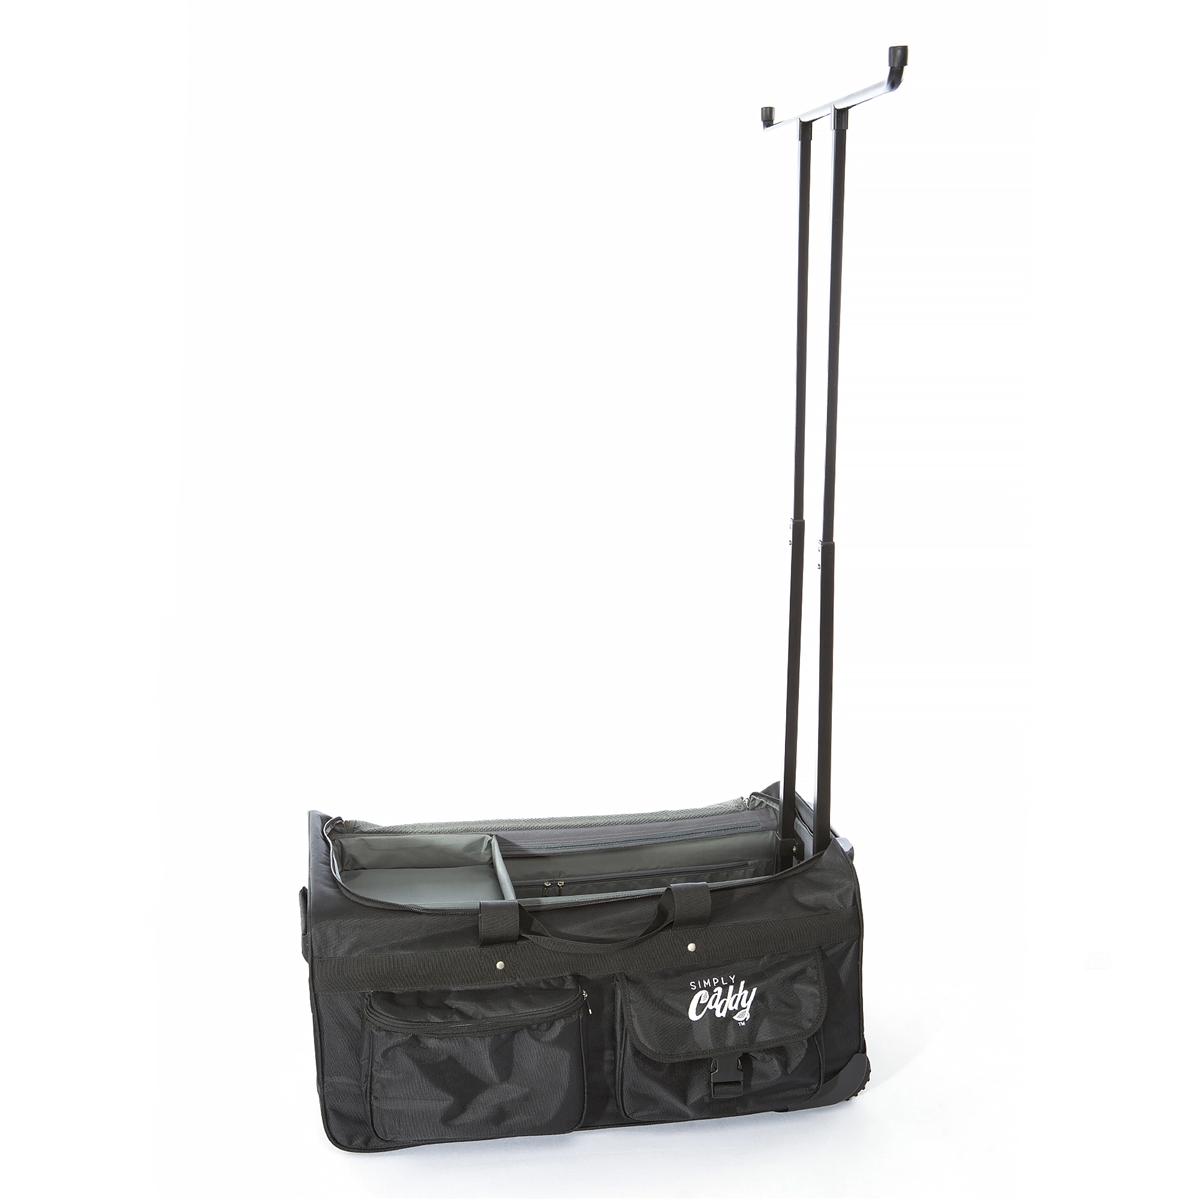 The Caddy Bag